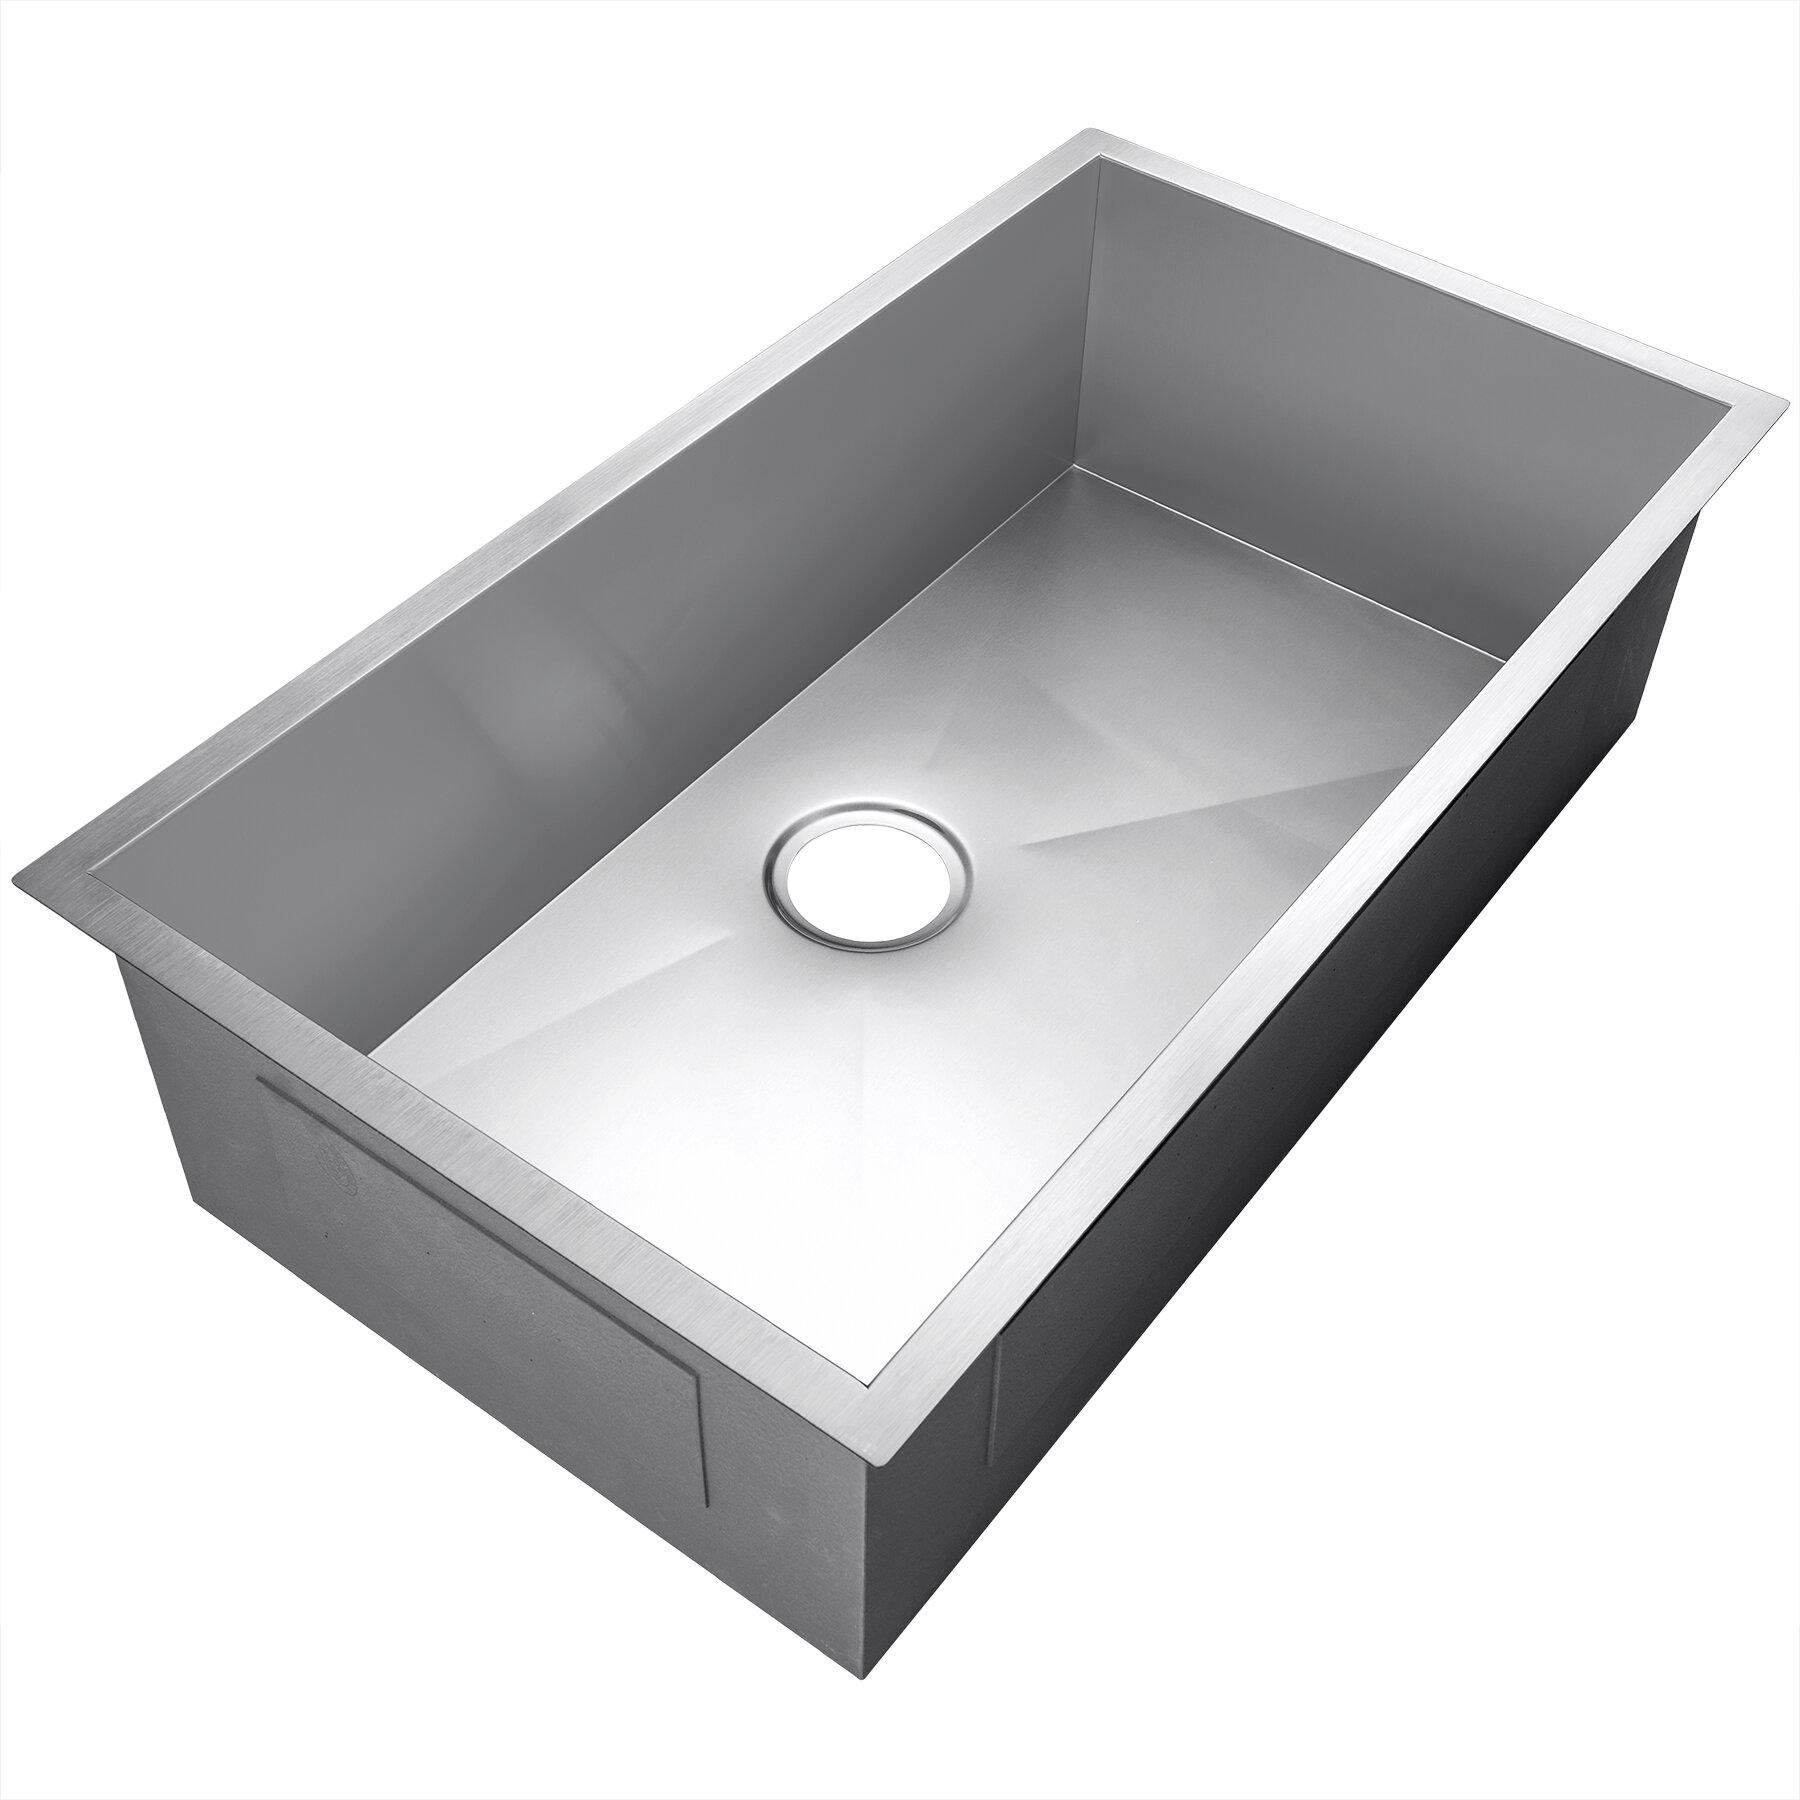 33 X 22 Undermount Stainless Steel Single Bowl Kitchen Sink Joss